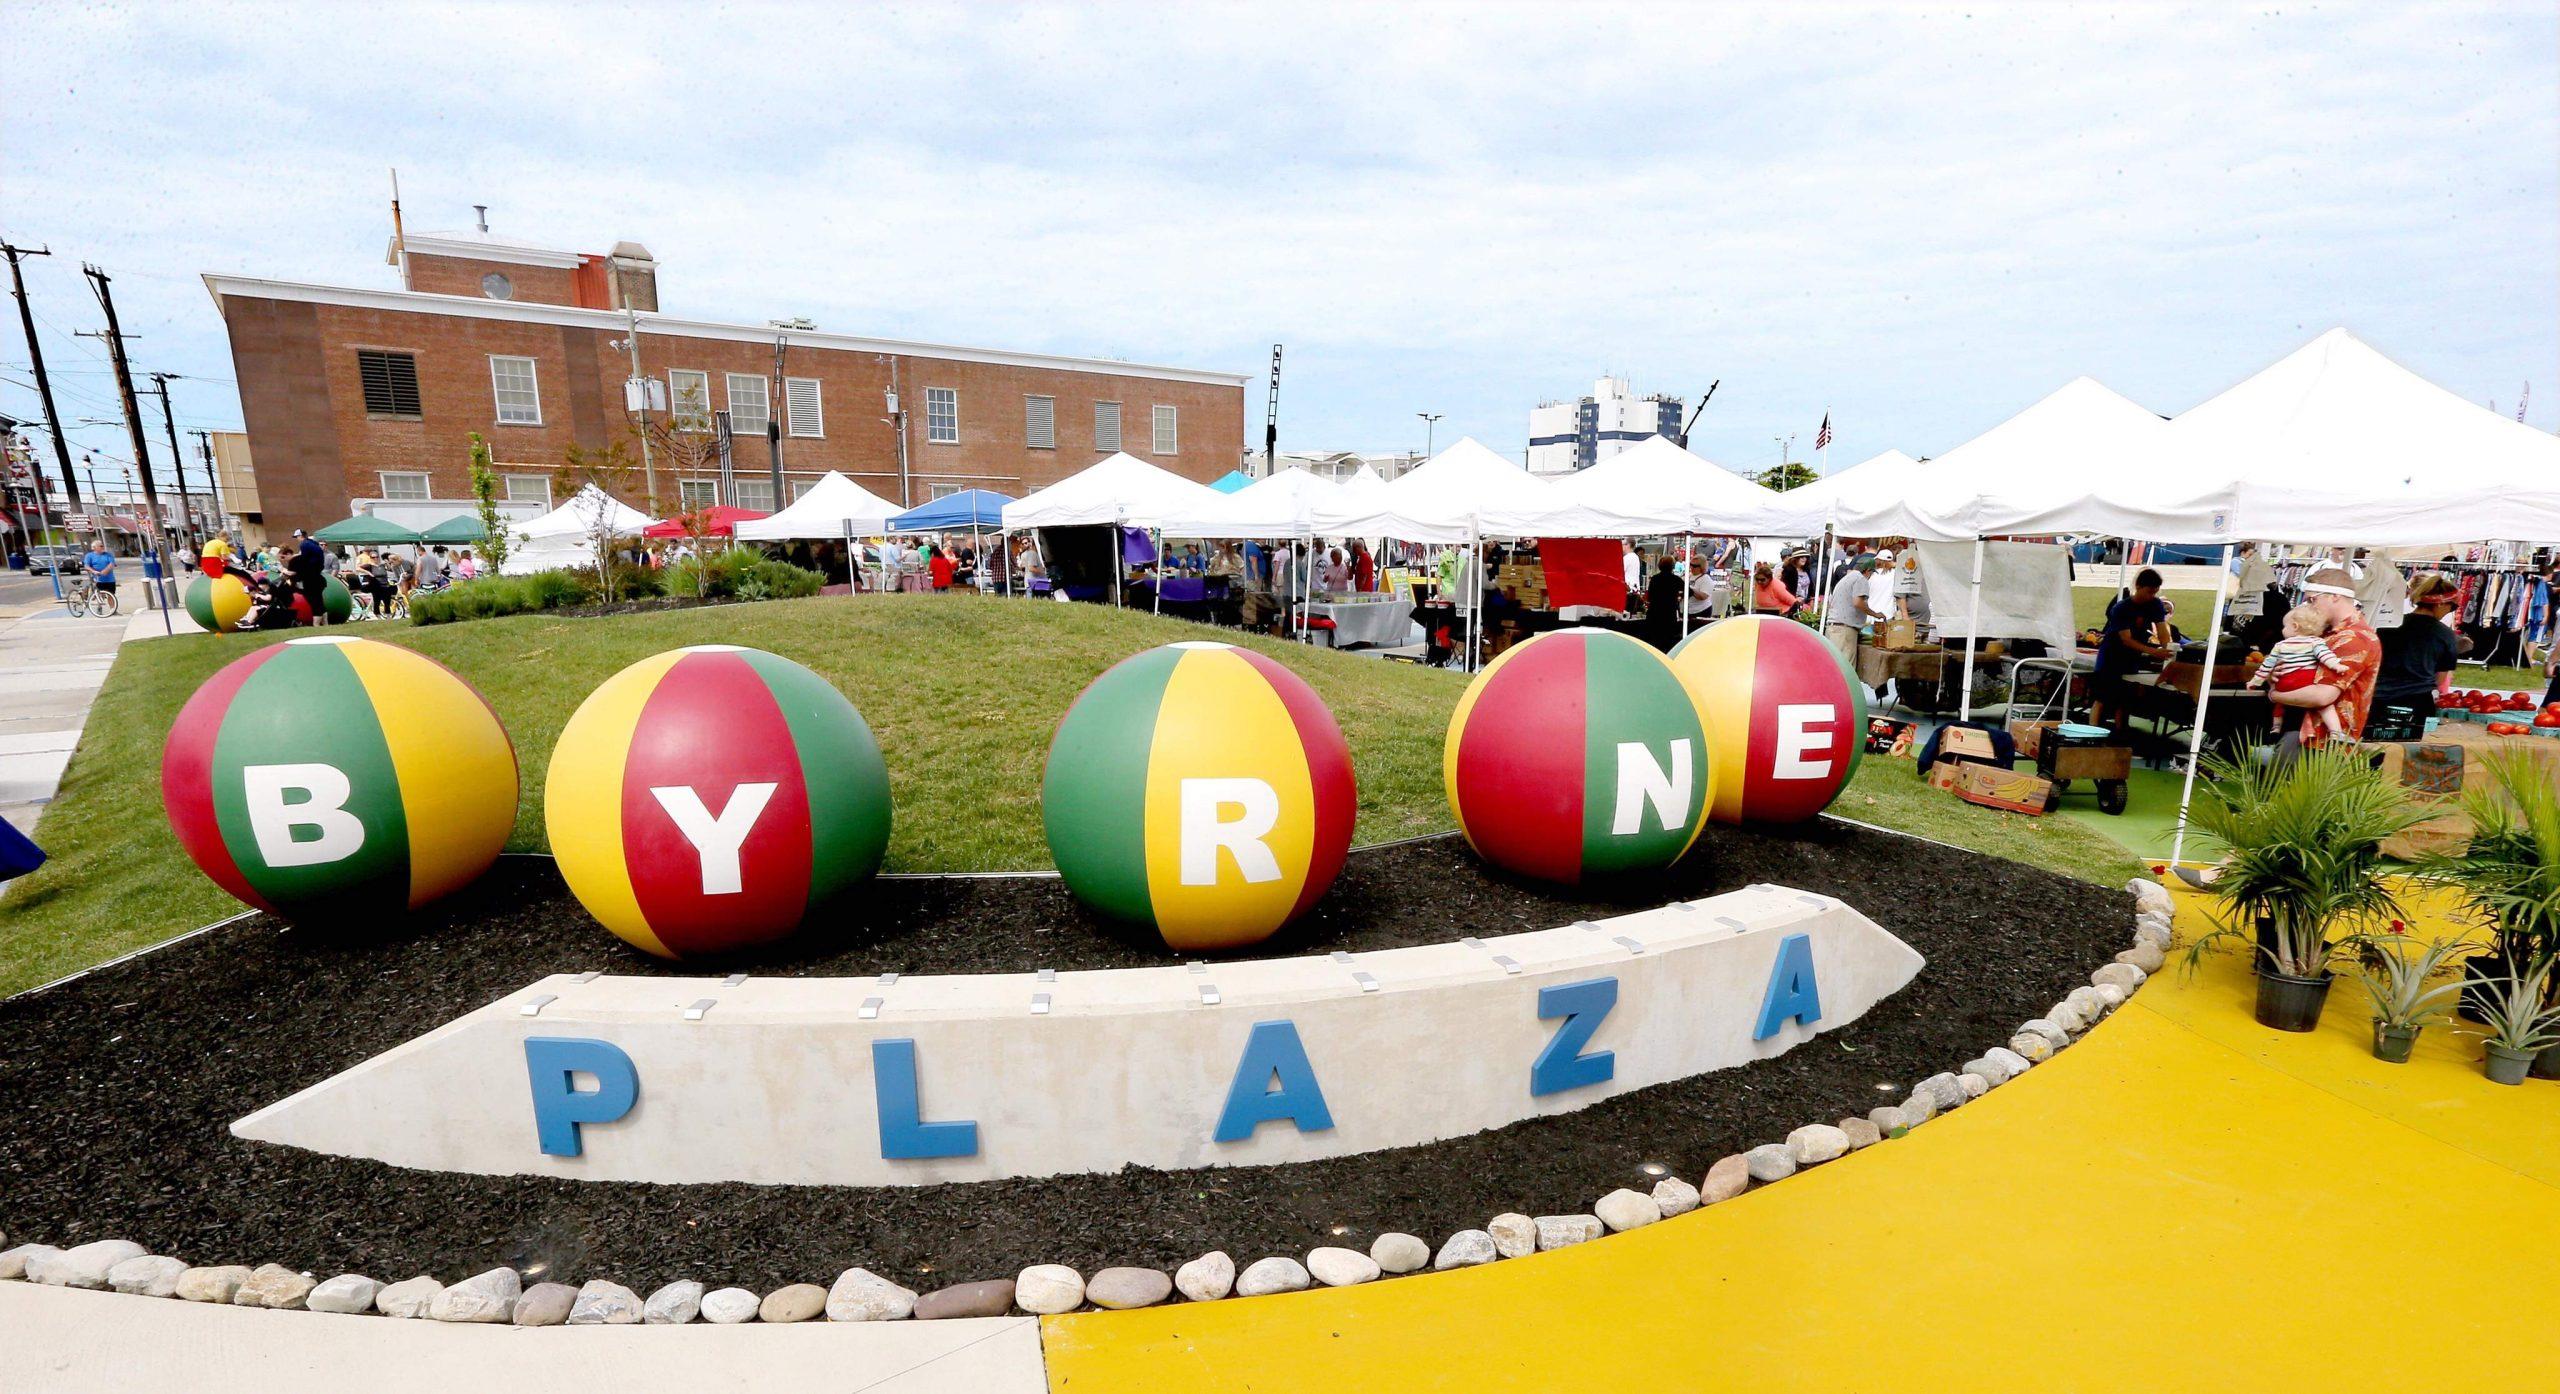 Byrne Plaza scaled